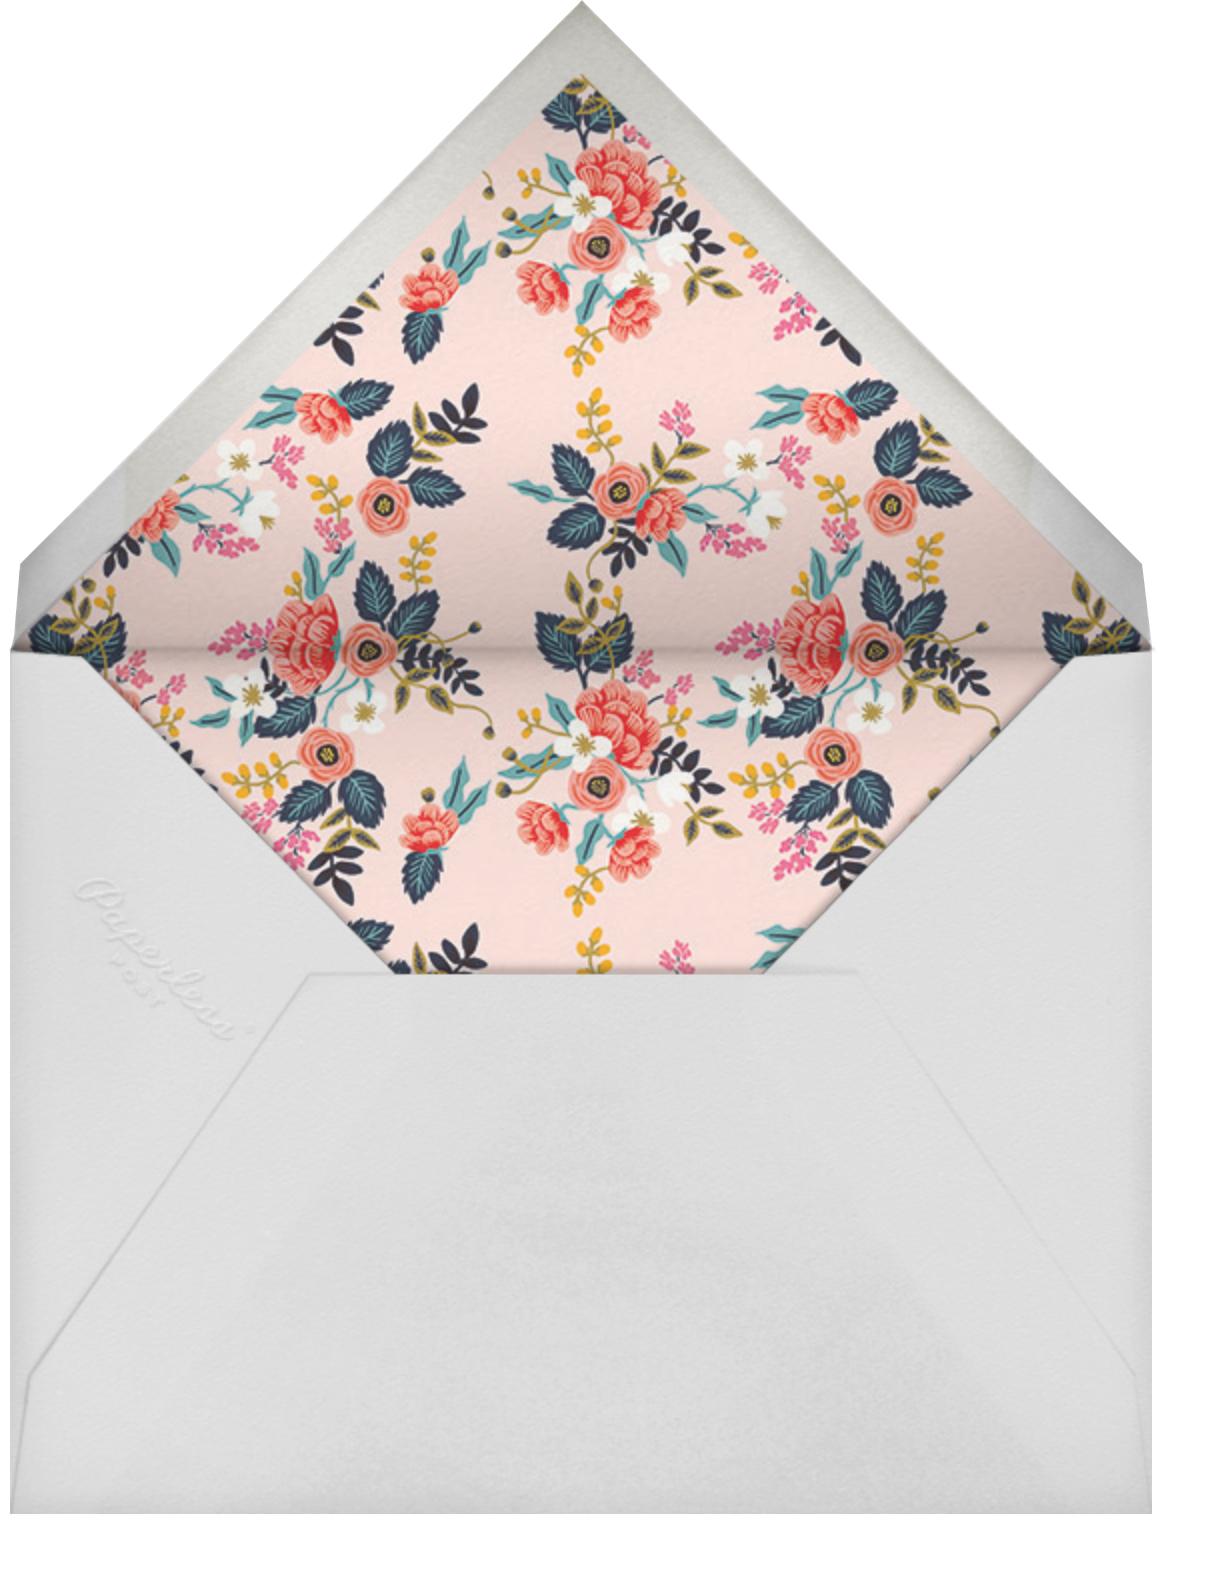 Birch Monarch (Tall Photo) - Rifle Paper Co. - Graduation party - envelope back